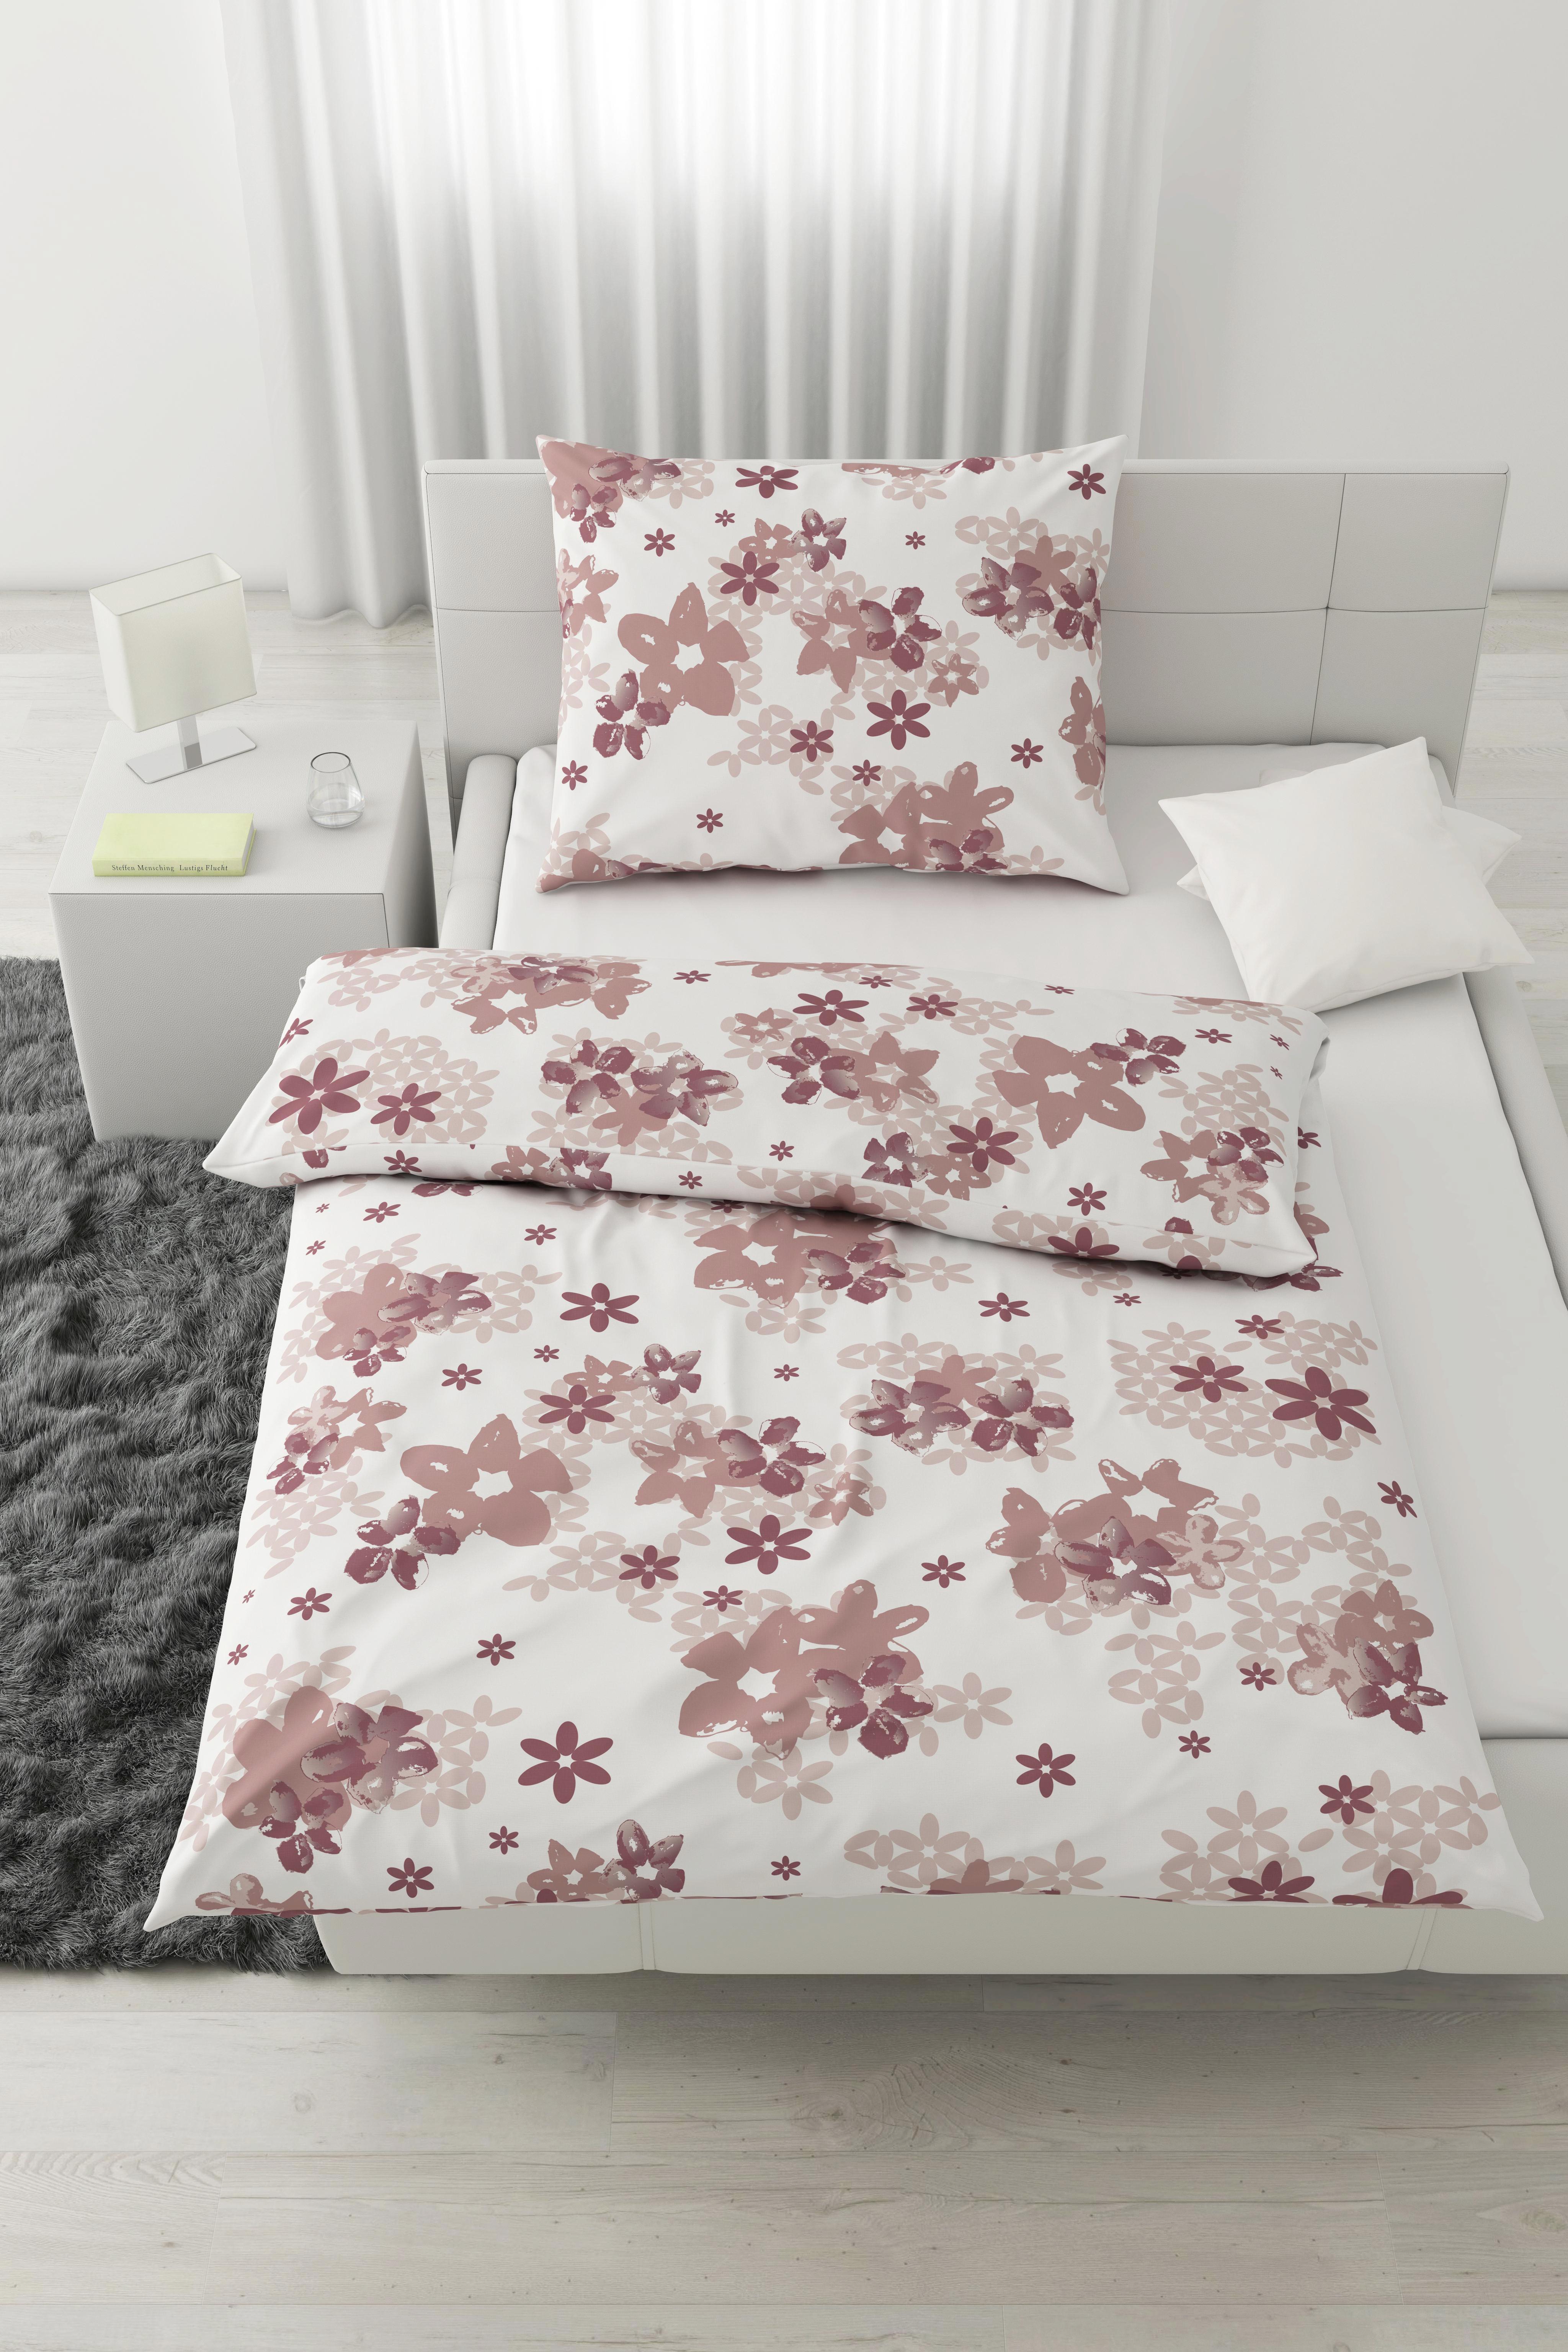 Bettwäsche Paula, ca. 140x200cm - Türkis/Rosa, Textil (140/200cm) - MÖMAX modern living